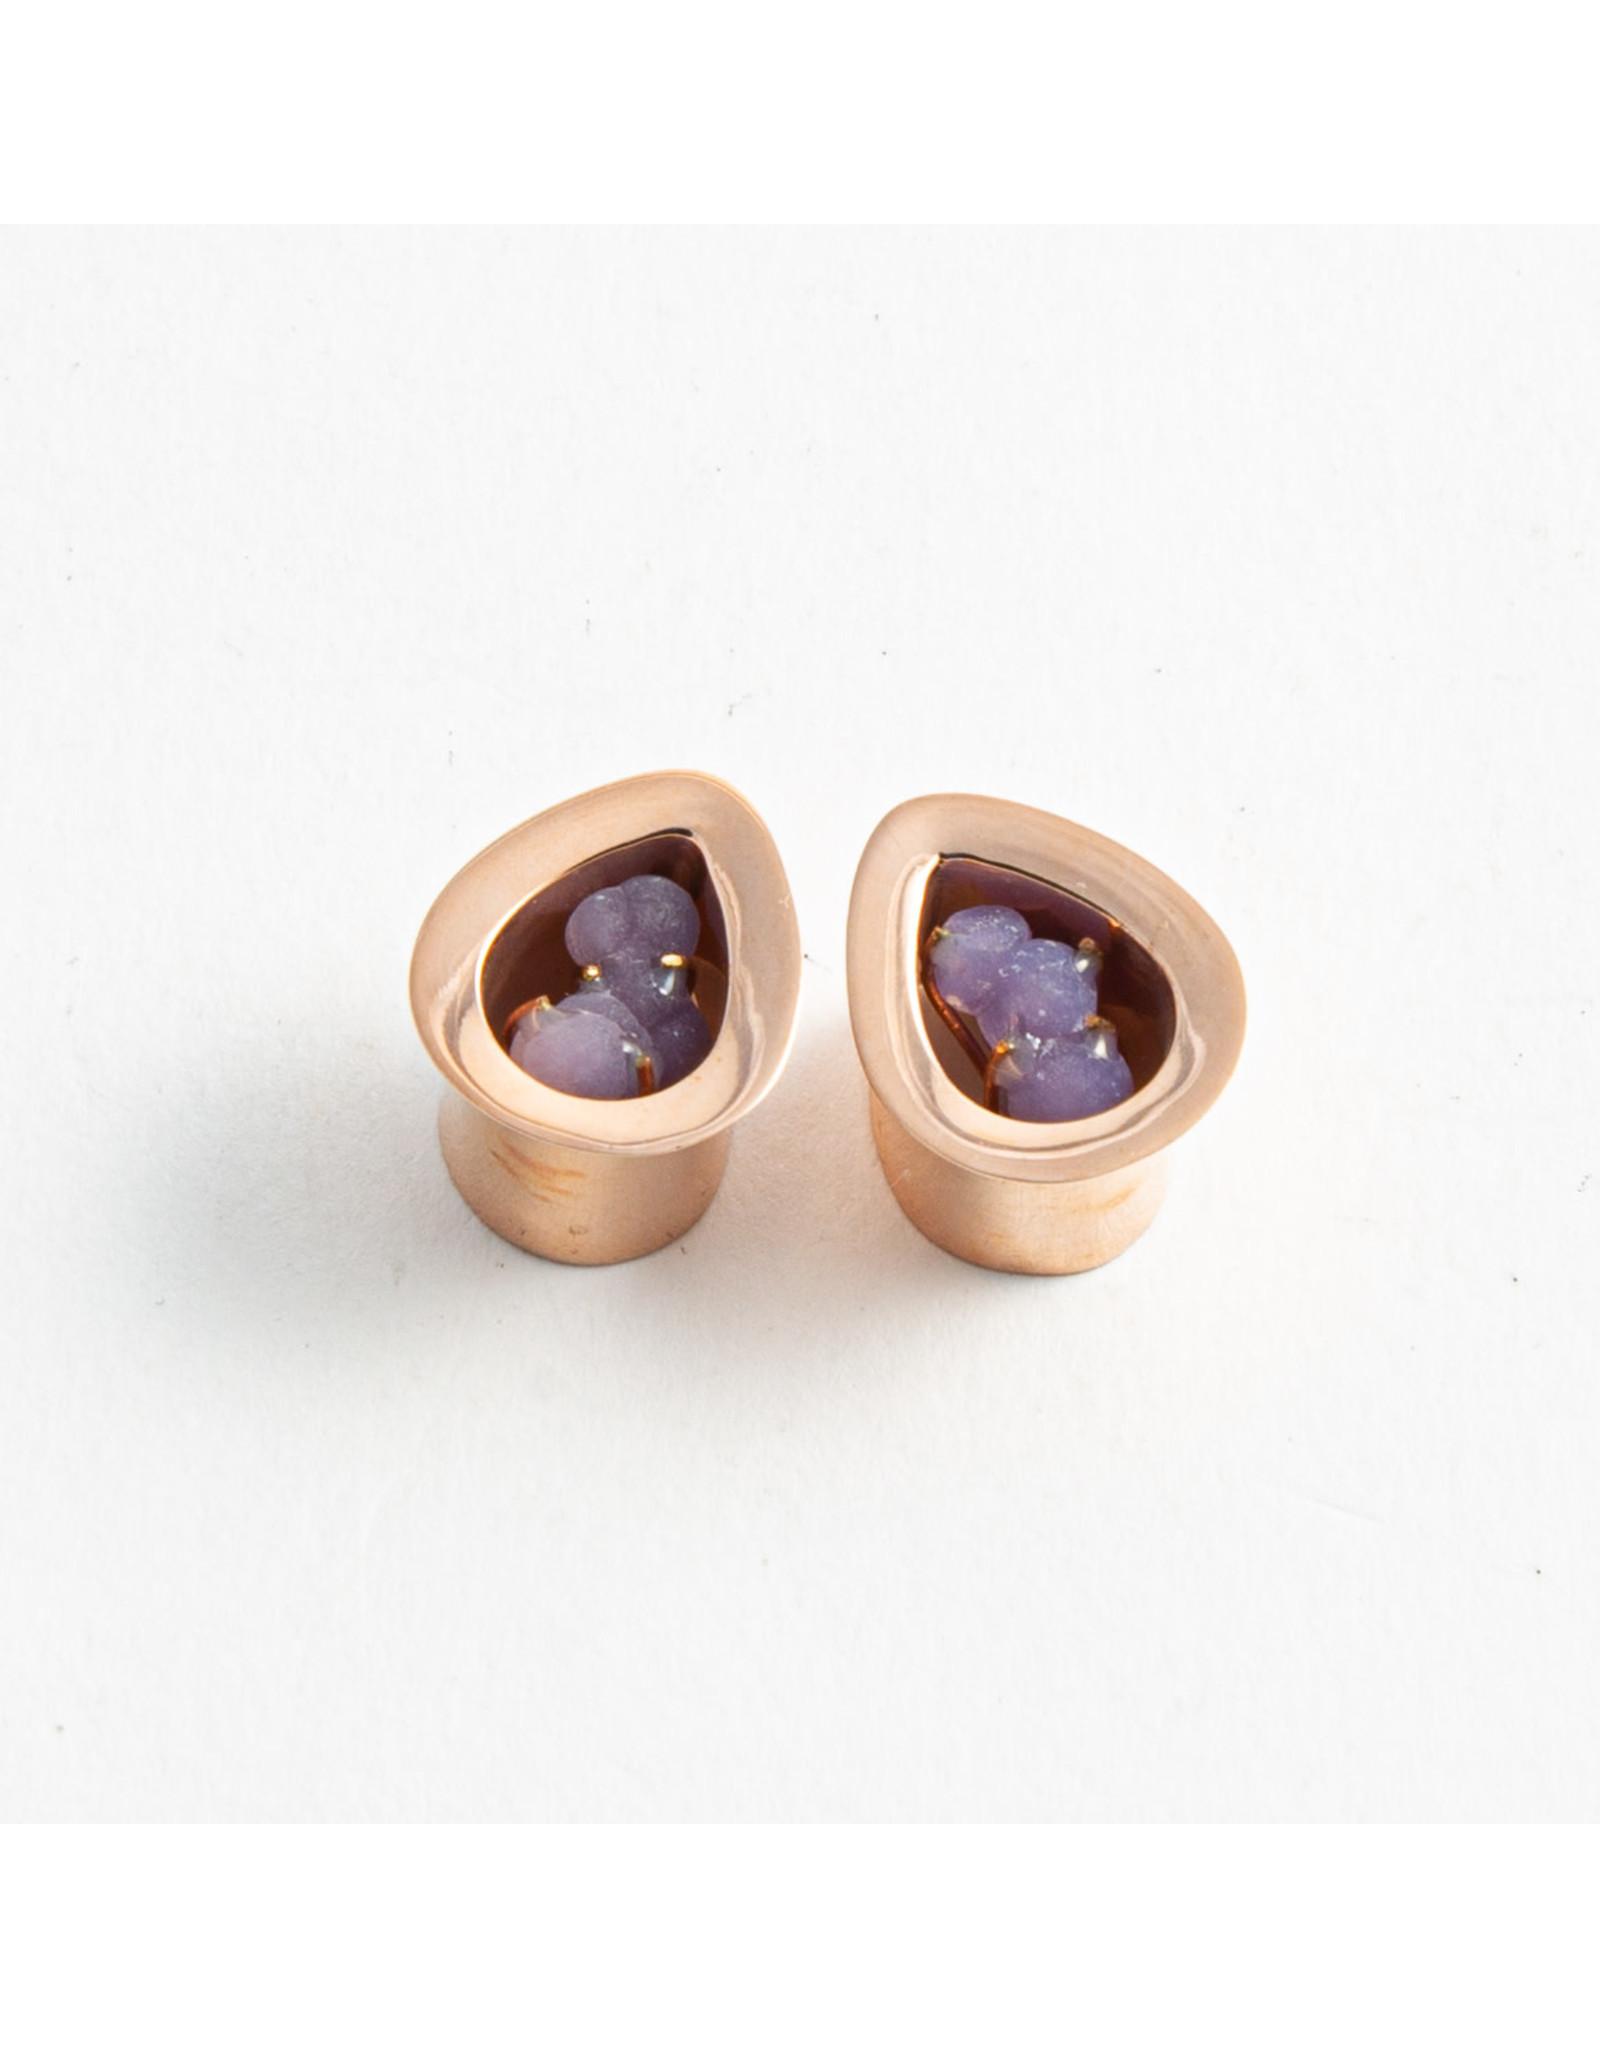 Buddha Jewelry Organics Buddha Jewelry Organics 1/2 Rose gold plate grape chalcedony mayan flare teardrop plug